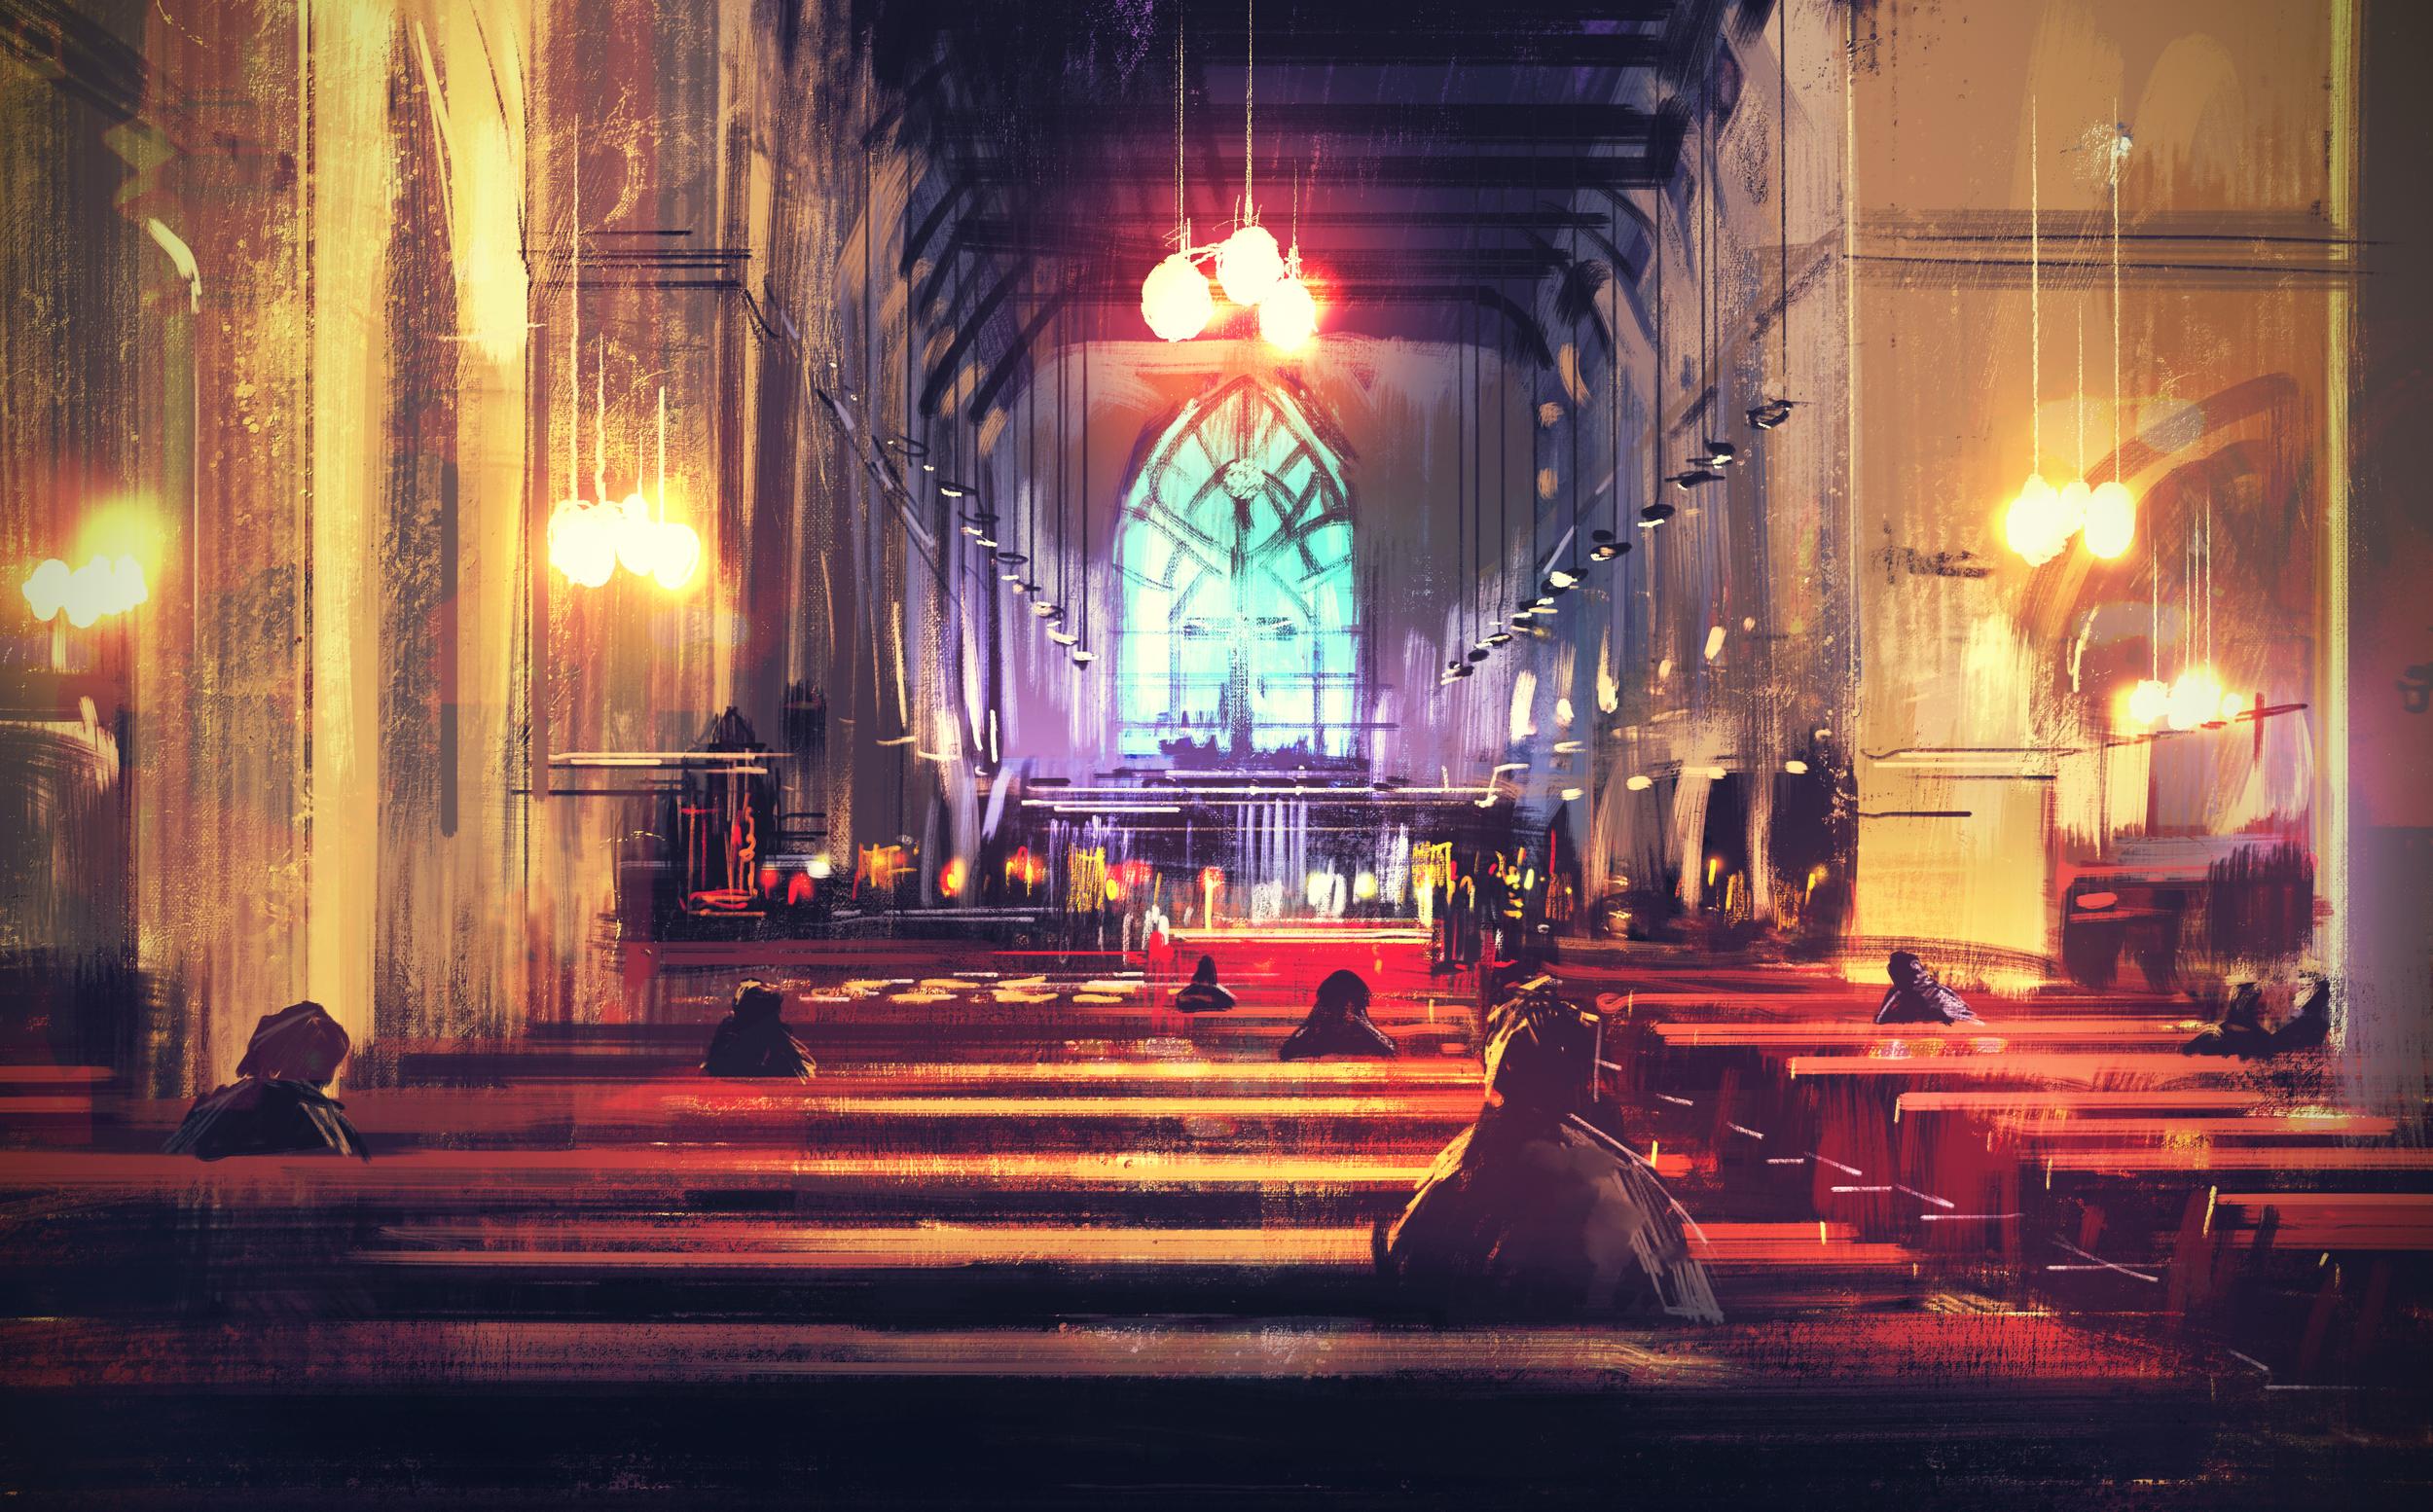 Sleeping Church - shegznstuff